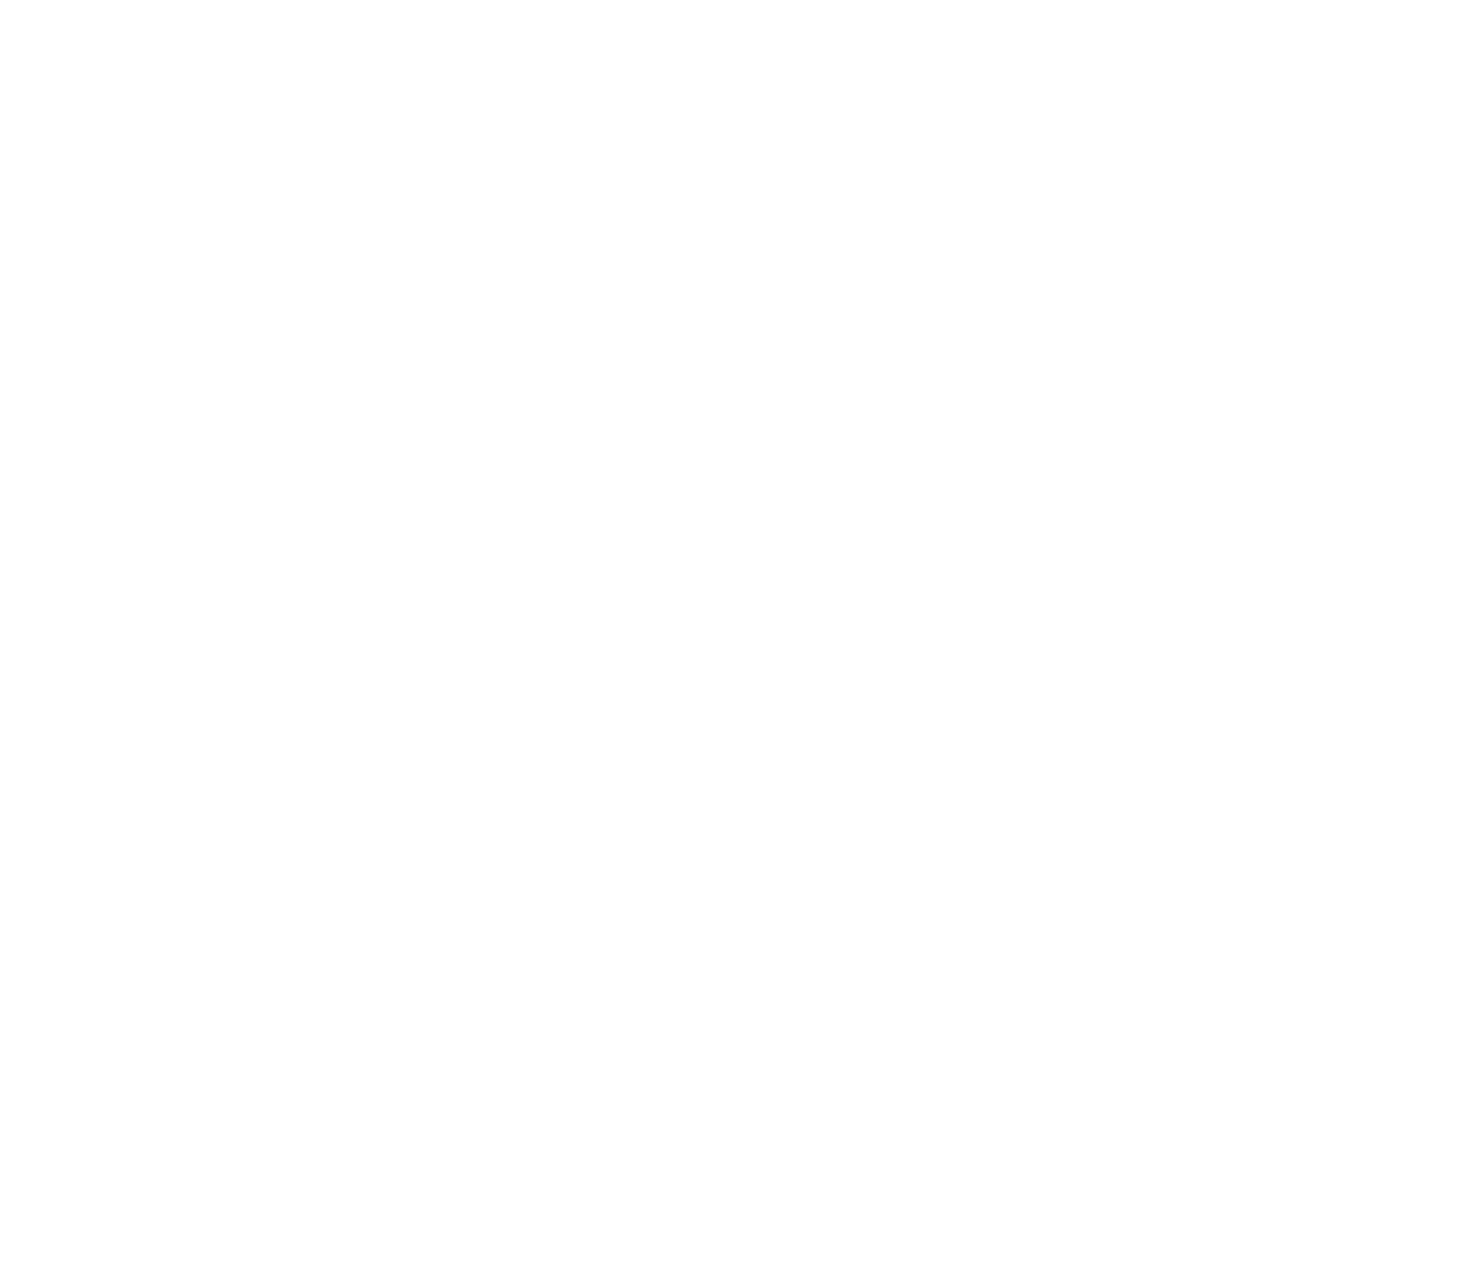 PT Repower Asia Indonesia Tbk